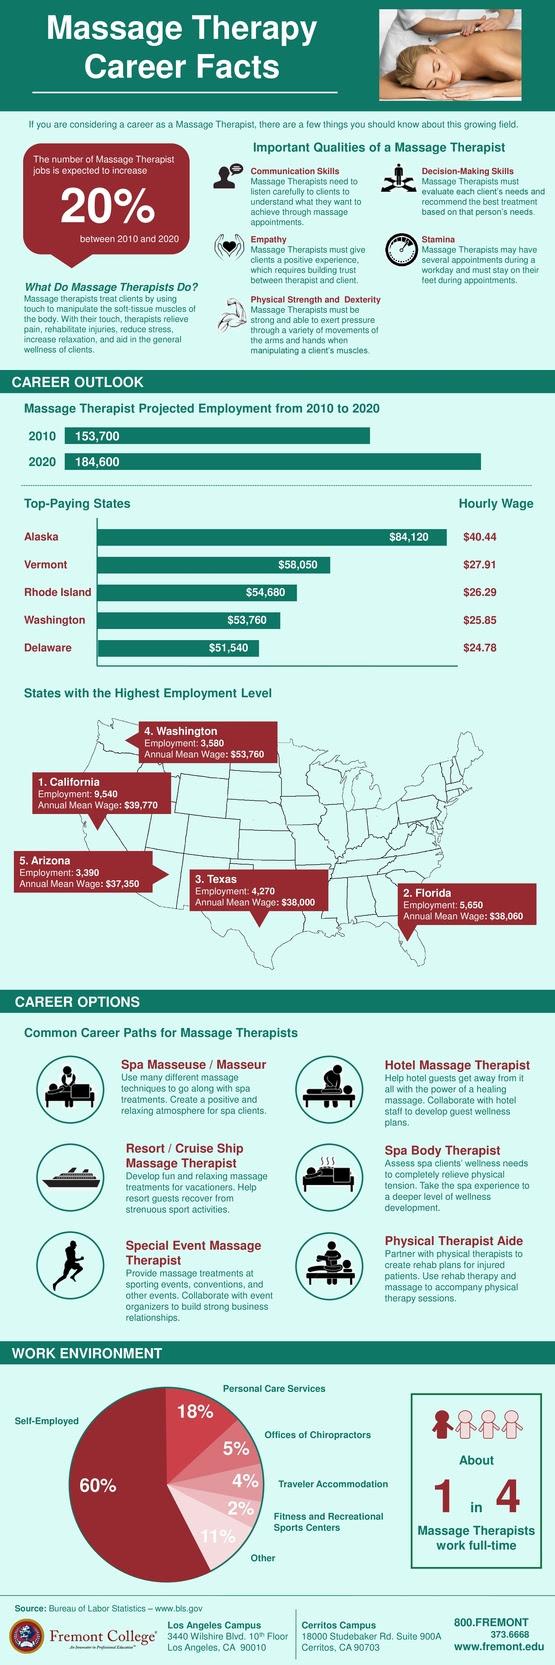 Massage Therapist Career Statistics   MassageBook